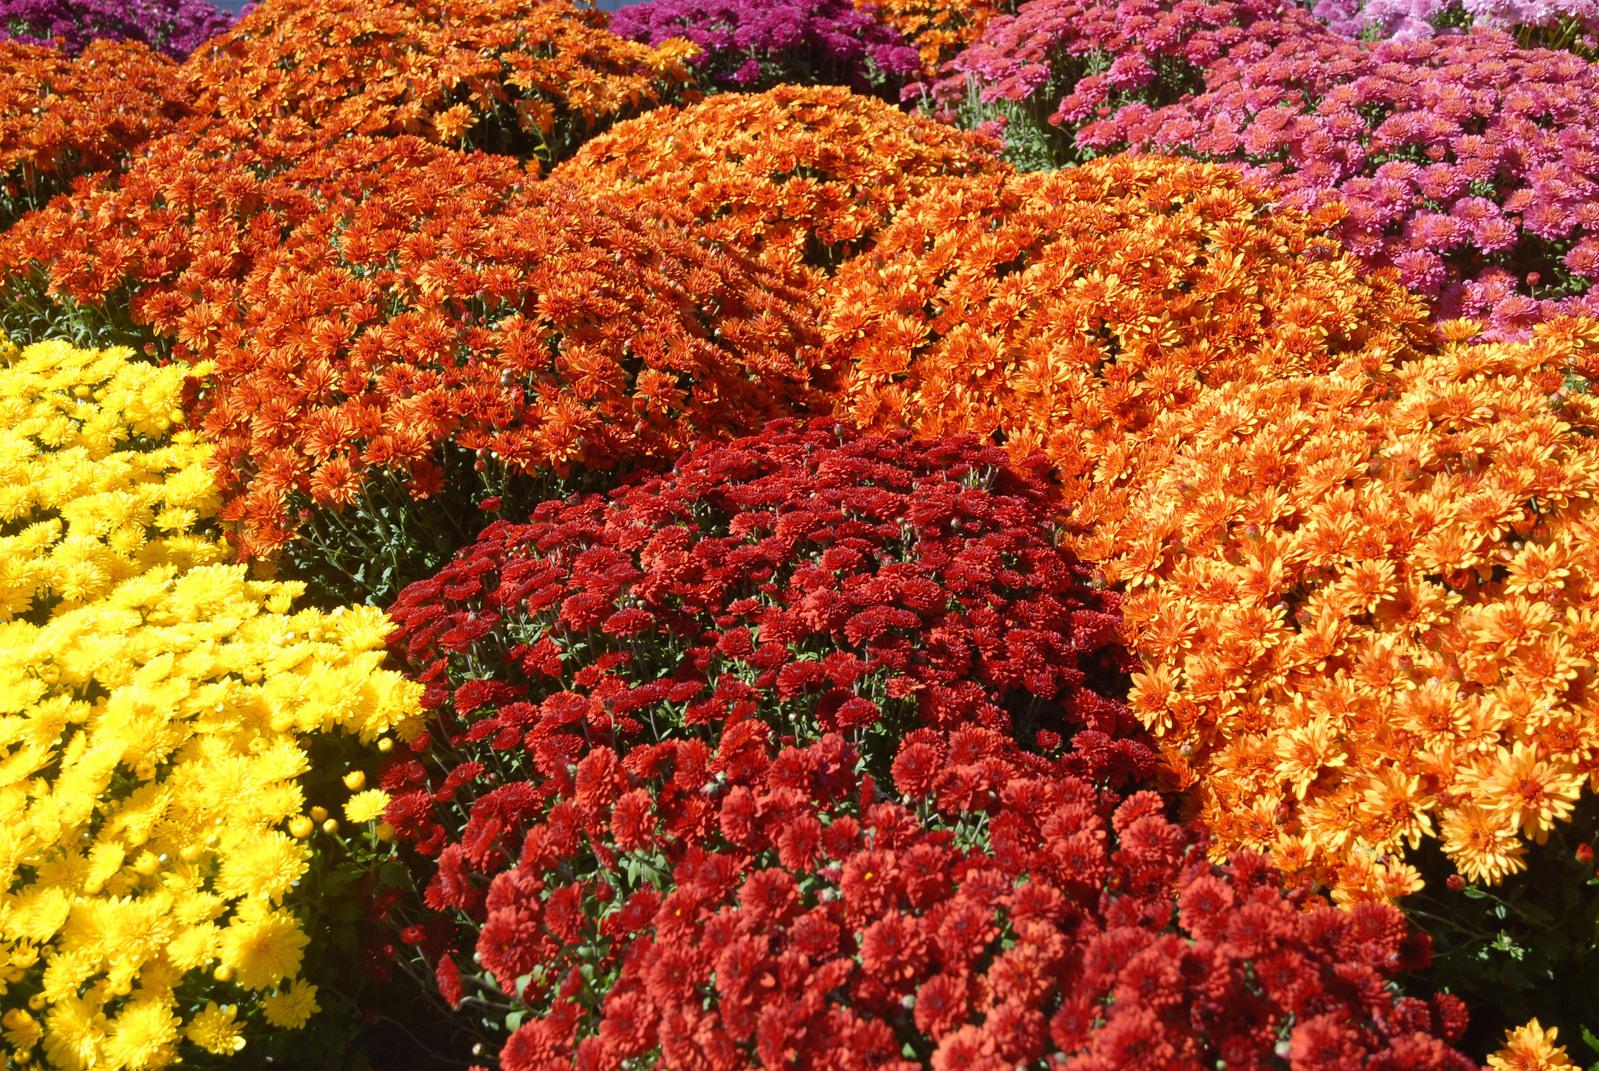 Autumn – the season for mums